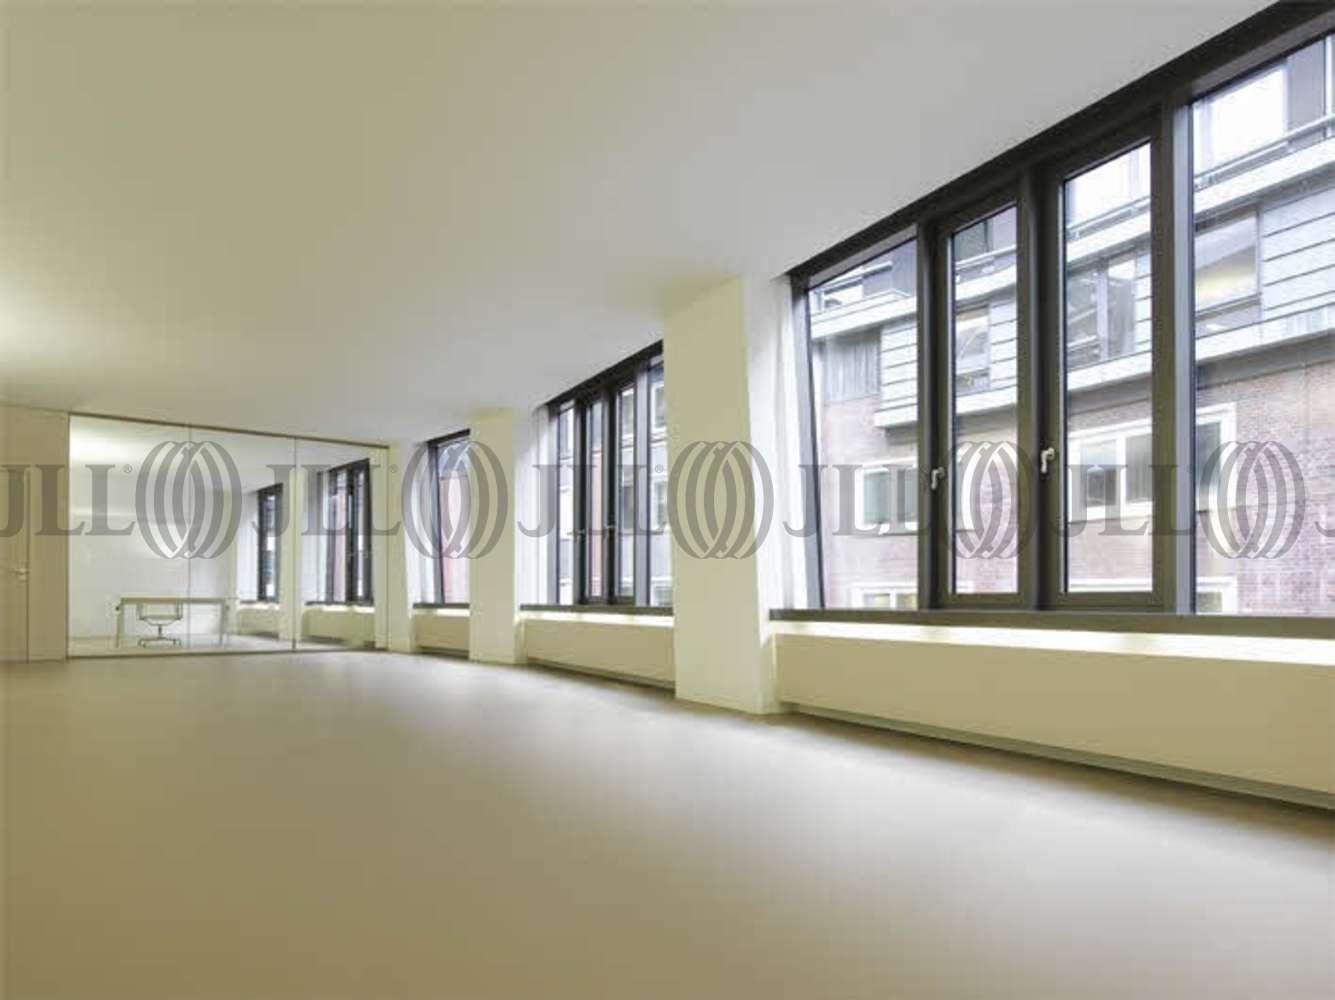 Büros Hamburg, 20457 - Büro - Hamburg, Hamburg-Altstadt - H0477 - 9398978